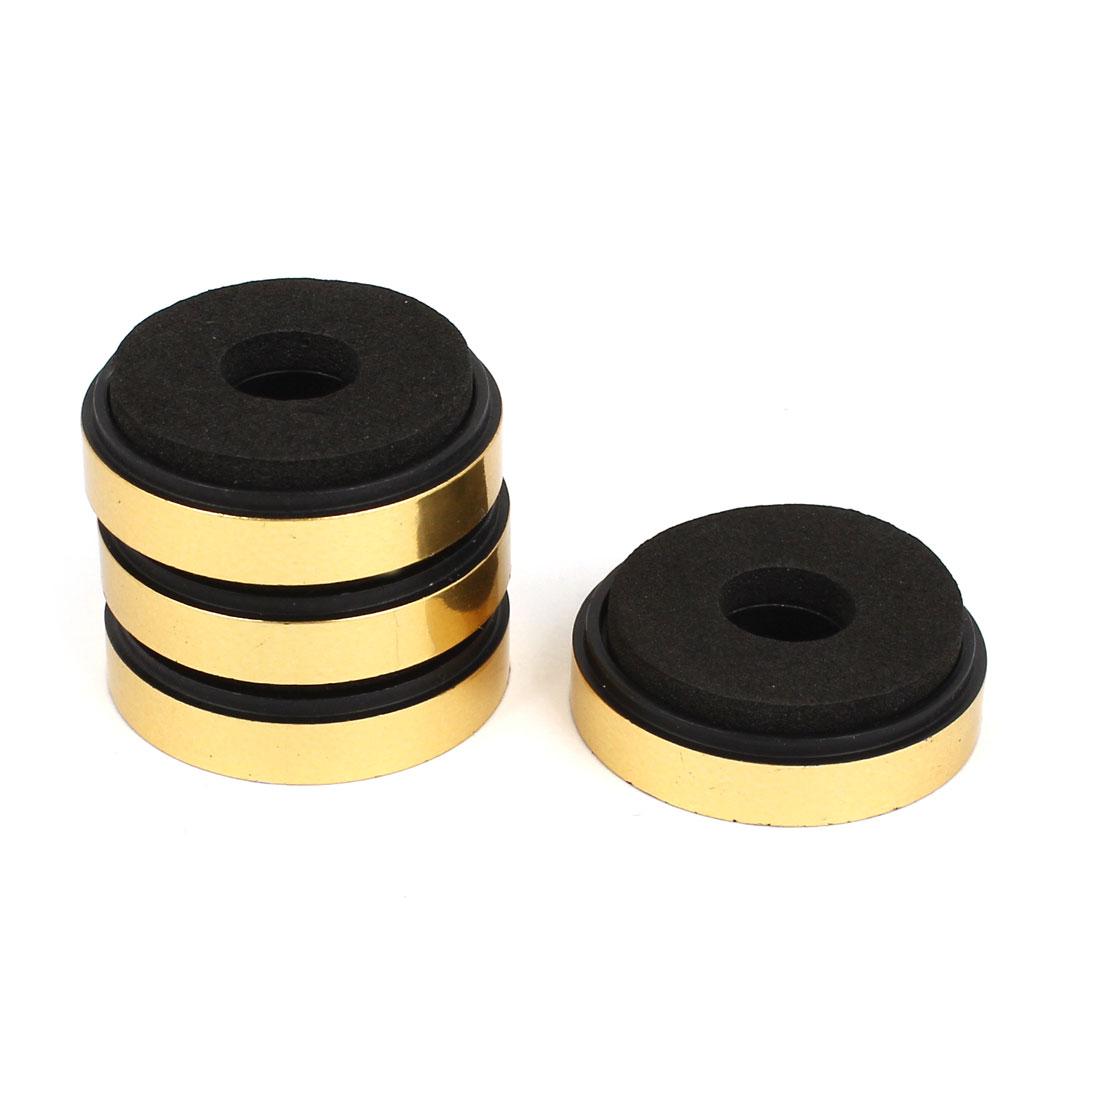 4 Pcs Anti Vibration Audio Amplifier Isolation Feet Stand Pad 3cm x 0.9cm